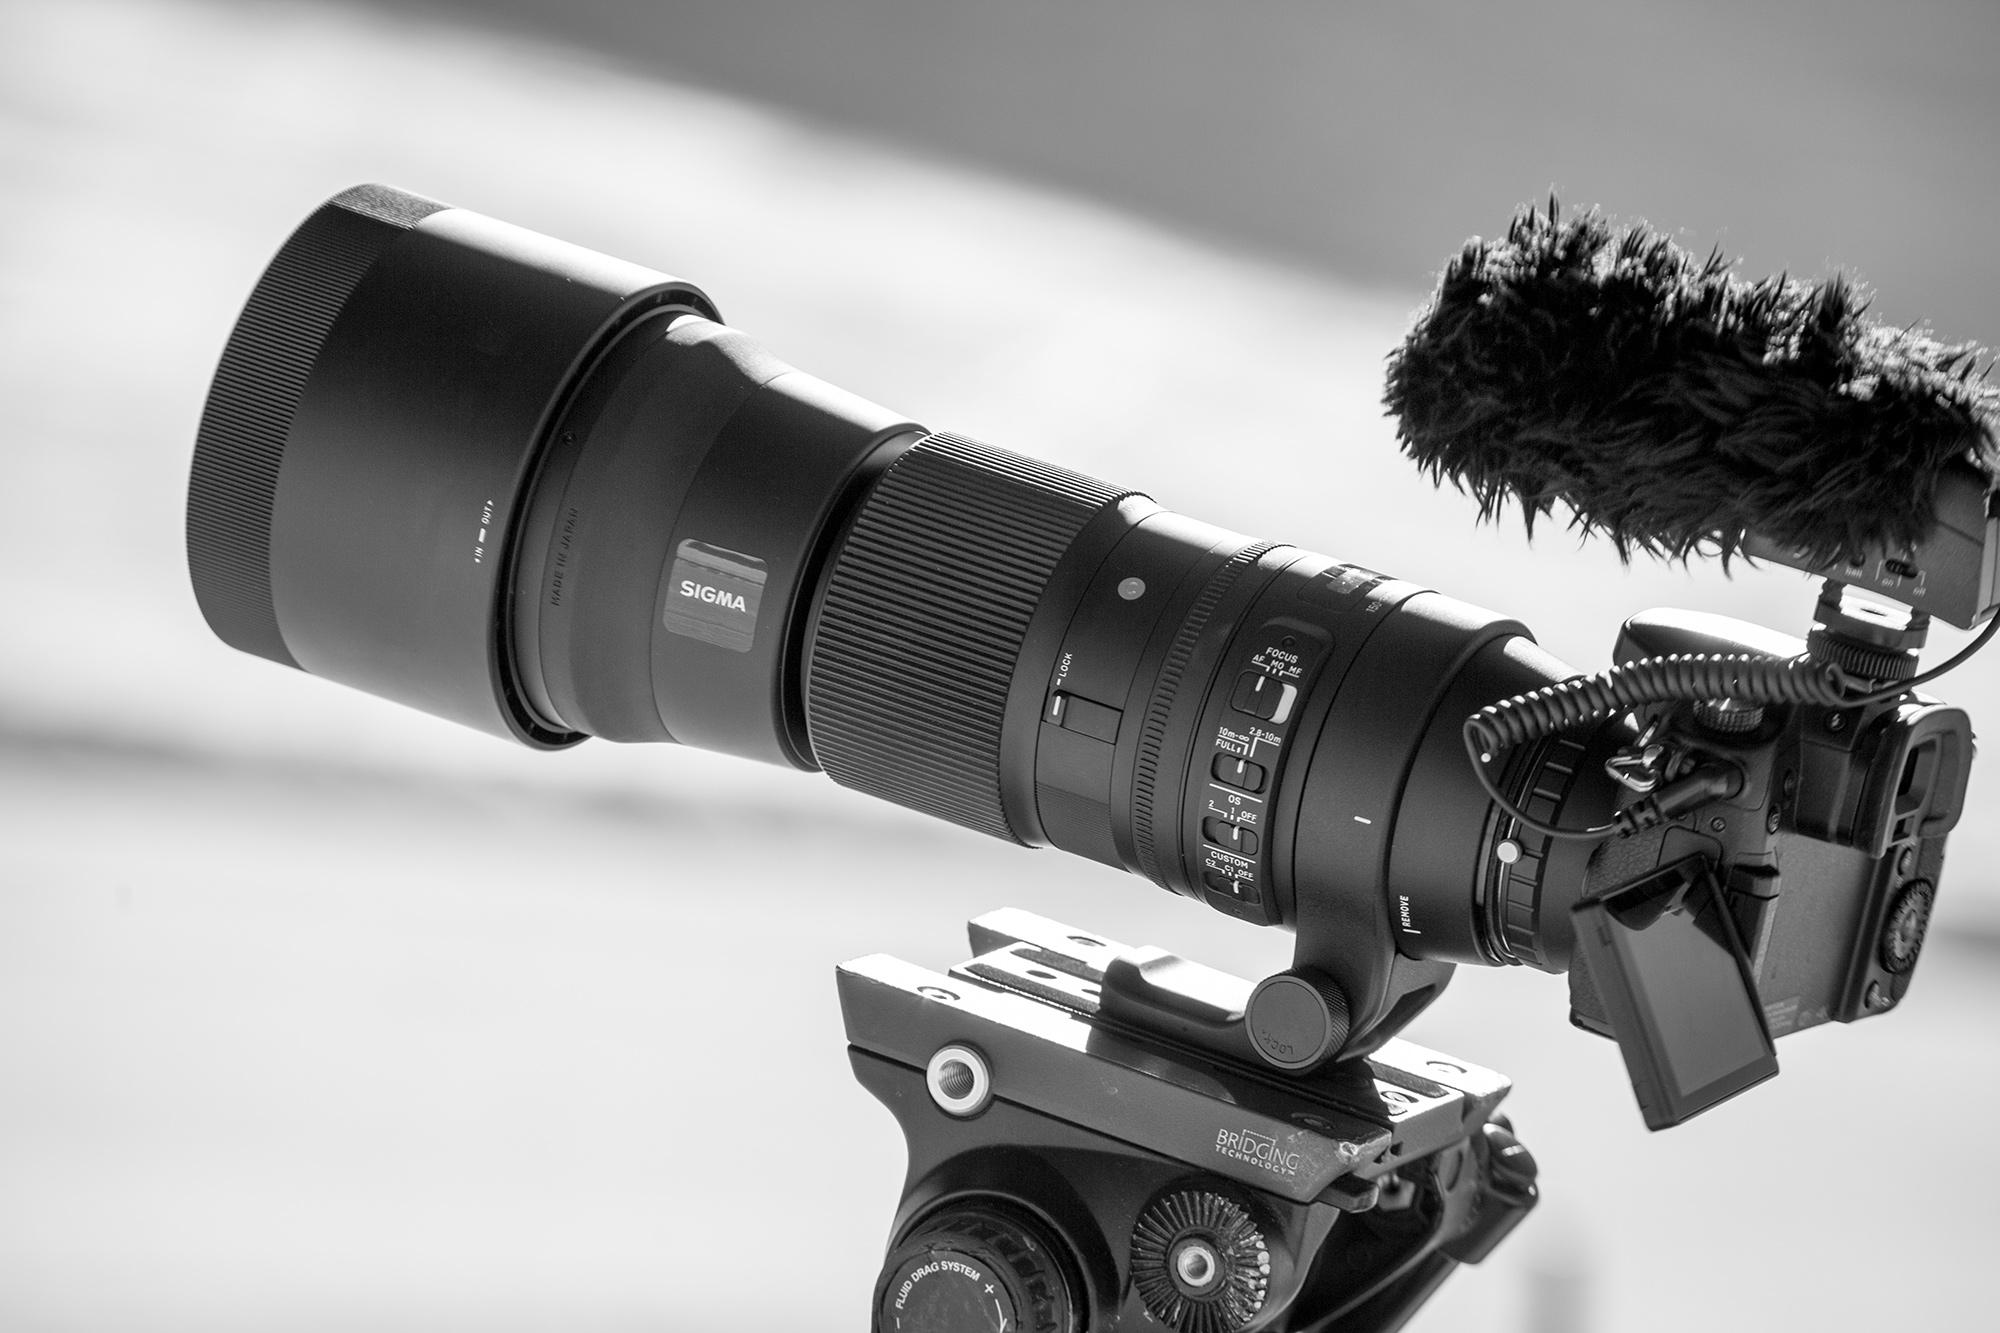 Sigma new long lens on a Panasonic-GH4